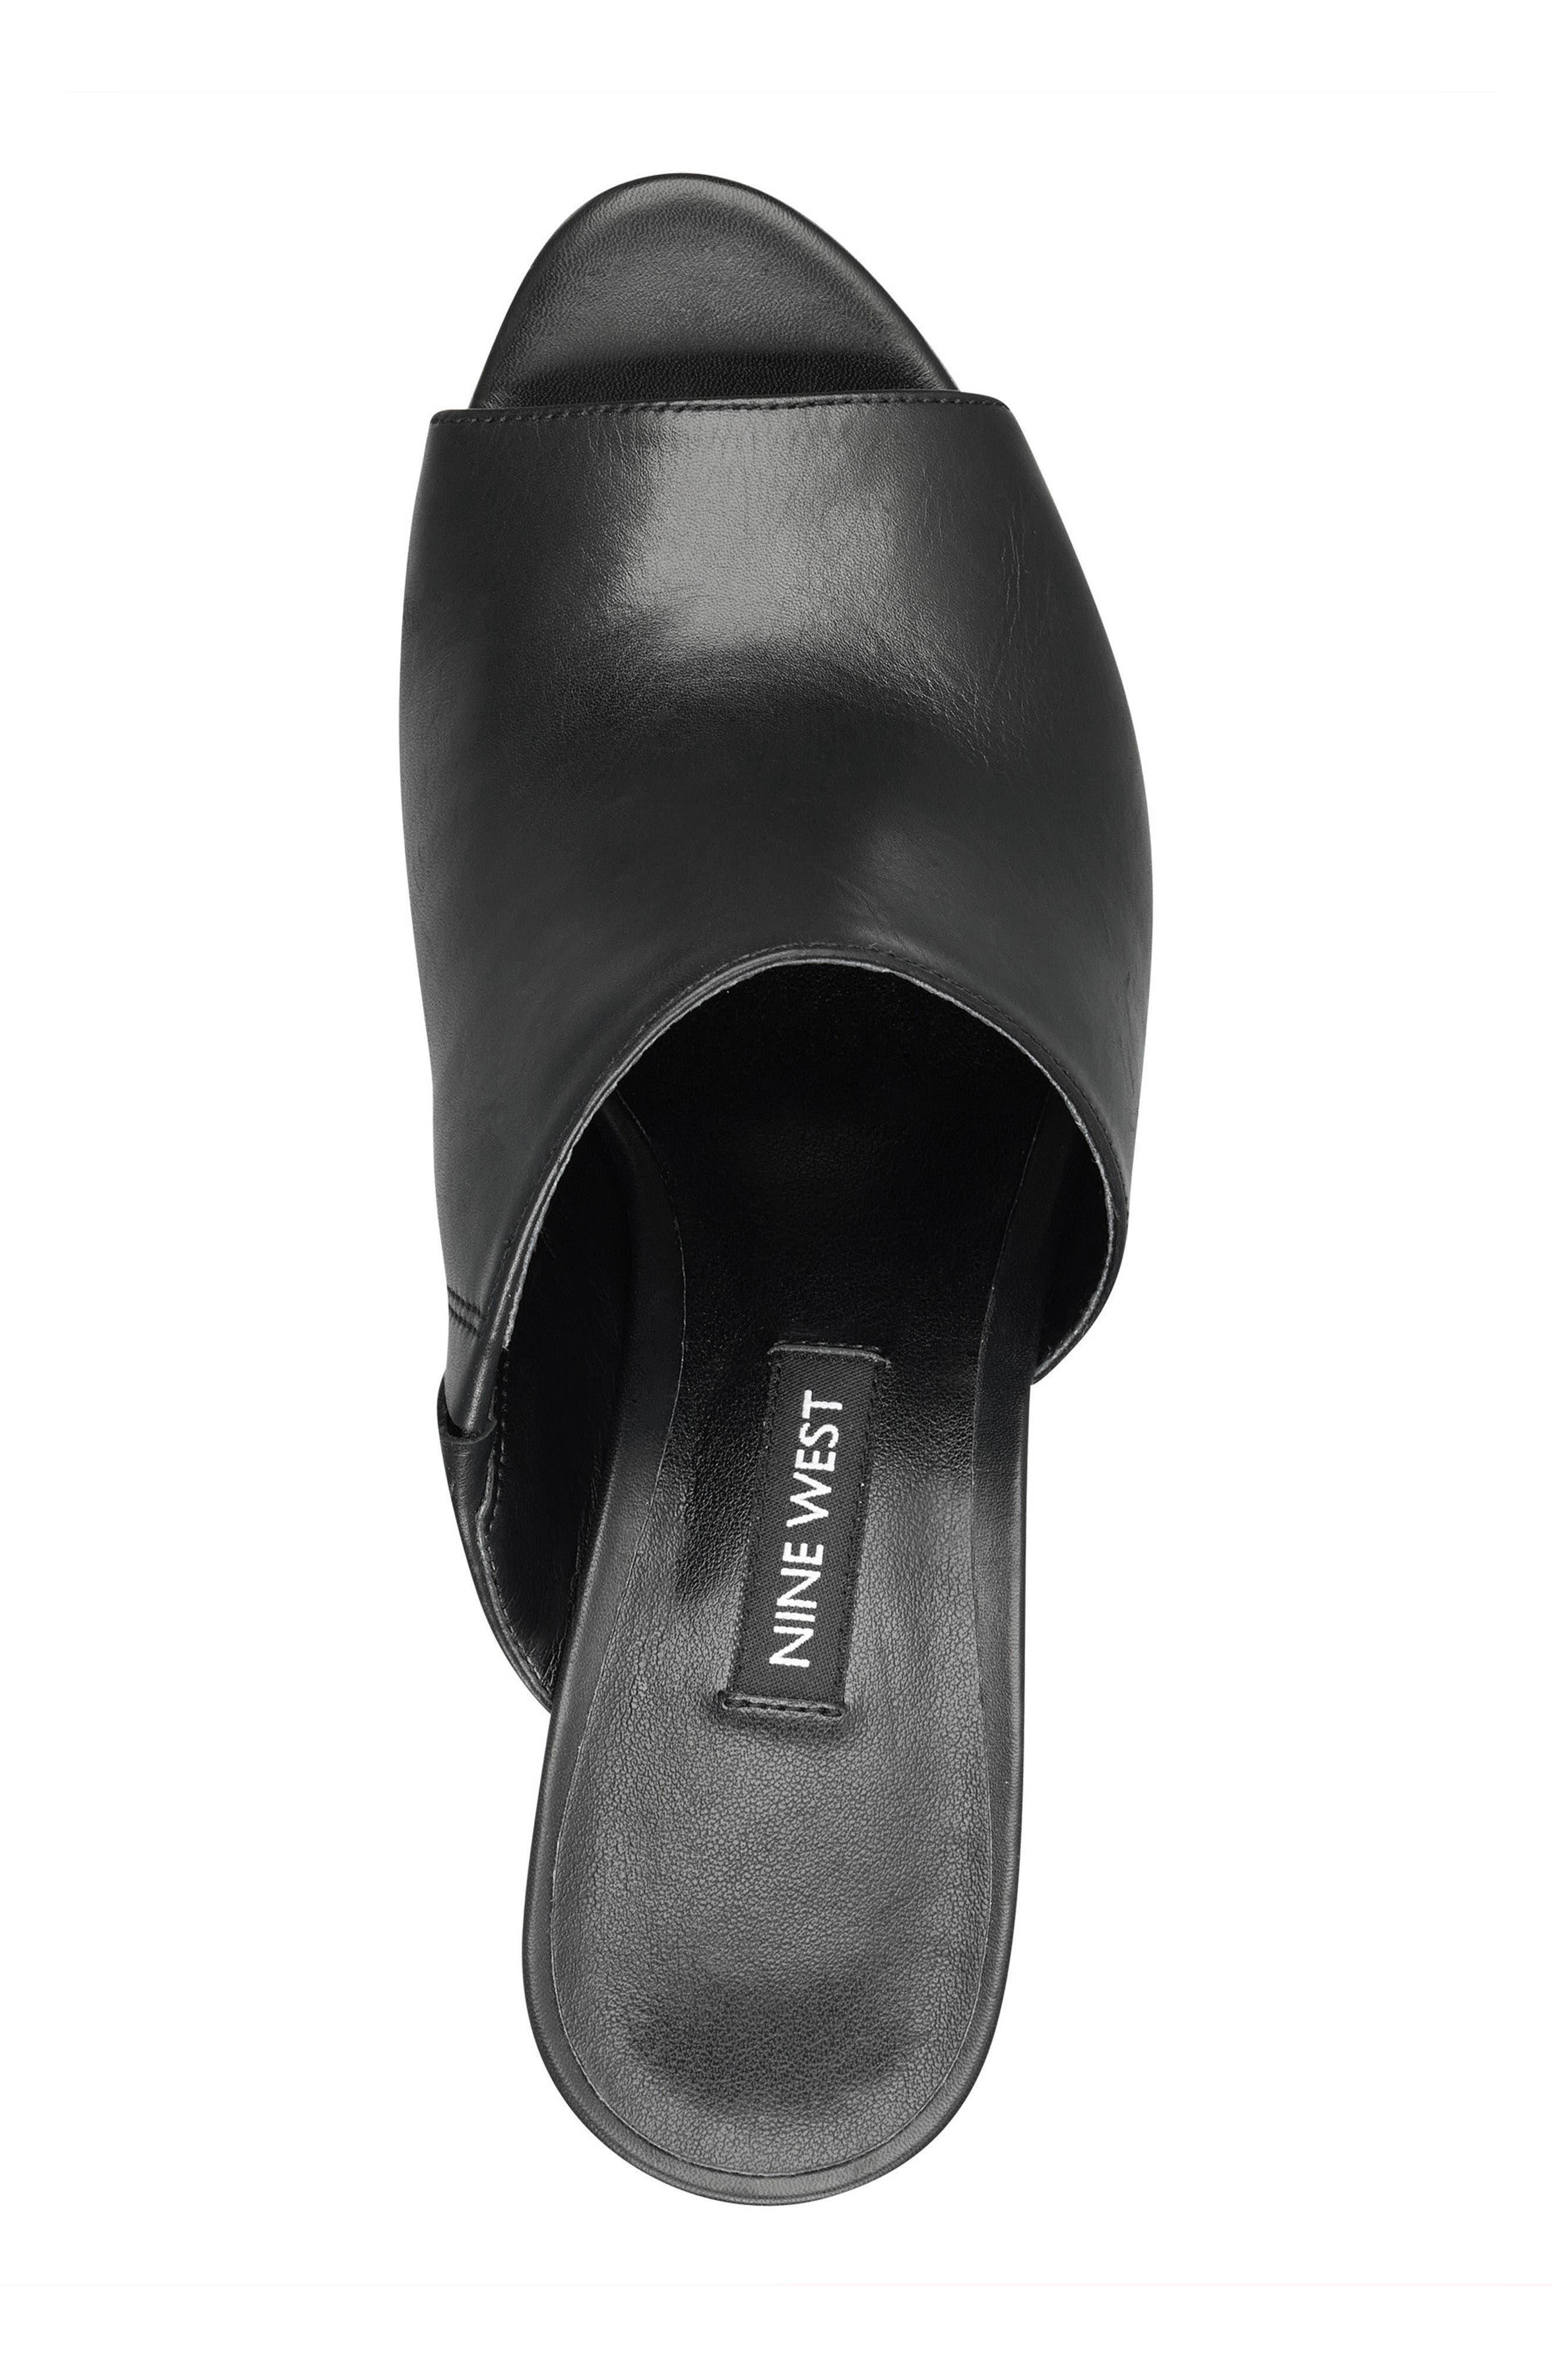 Janissah Wedge,                             Alternate thumbnail 5, color,                             Black Leather